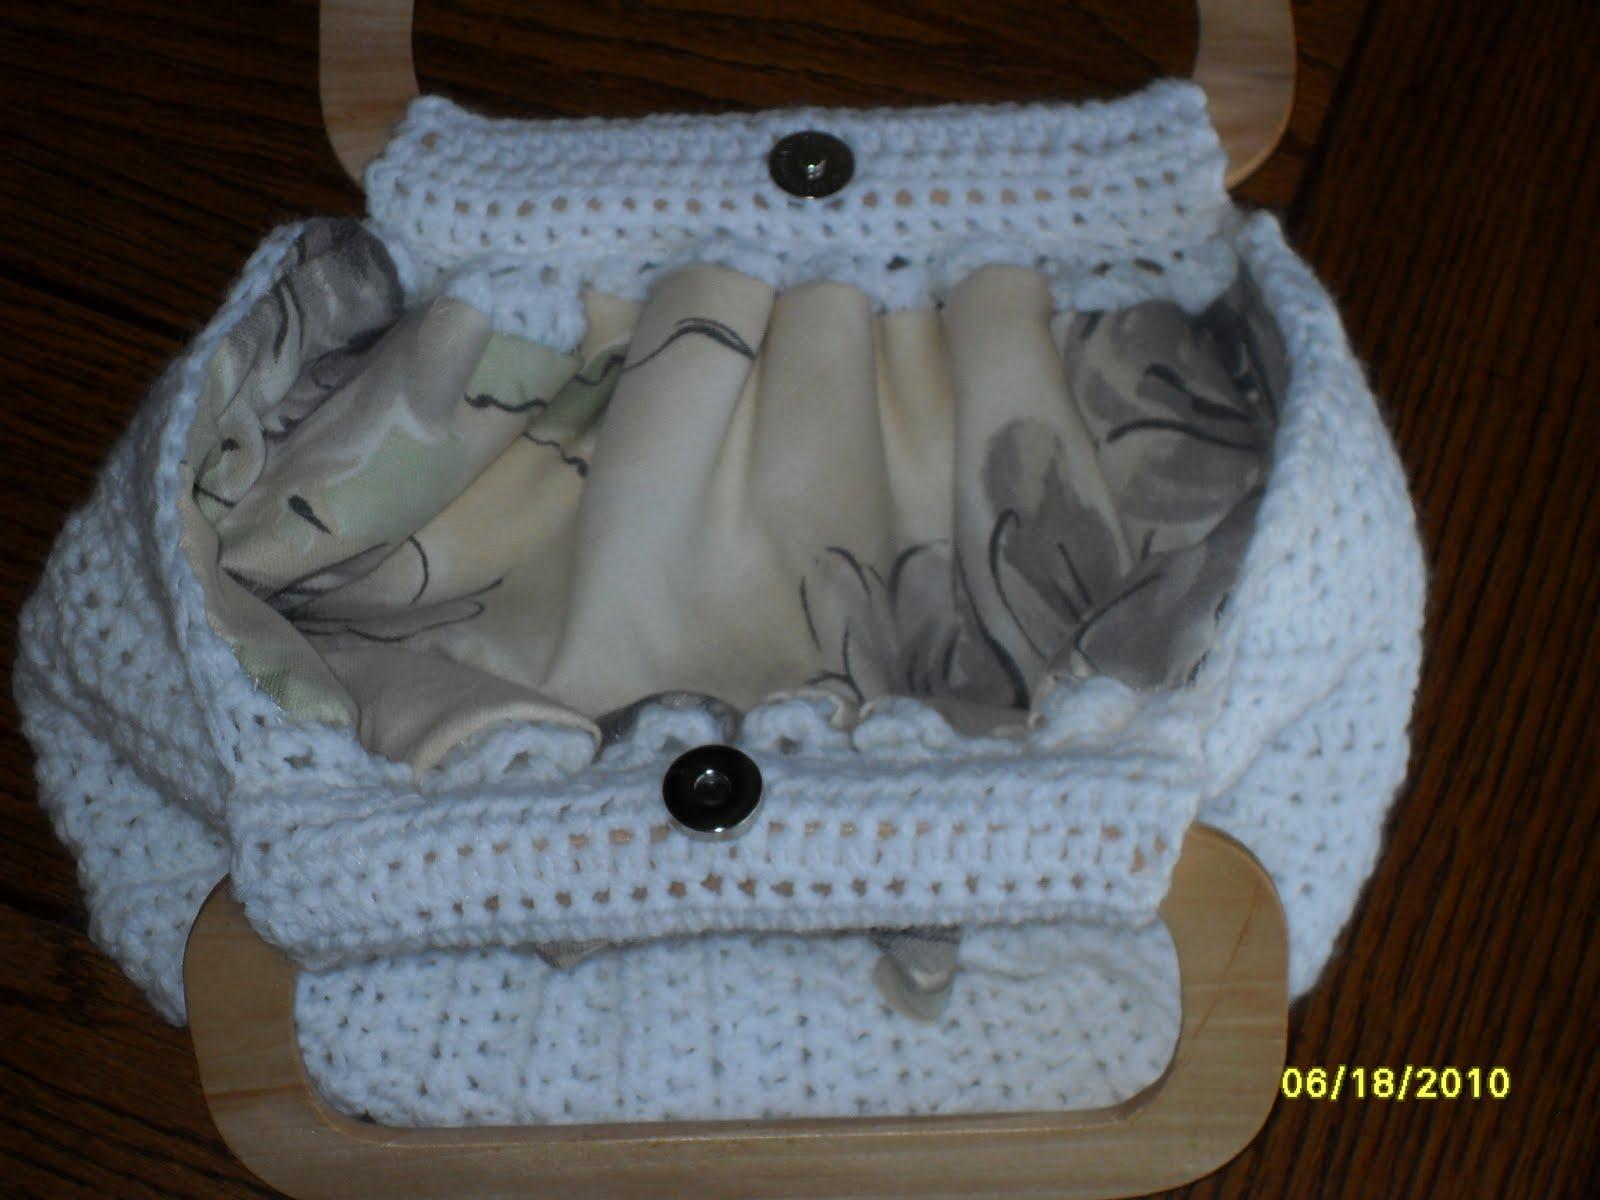 Yarn Fettish in Crochet: Fat Bottom Bag